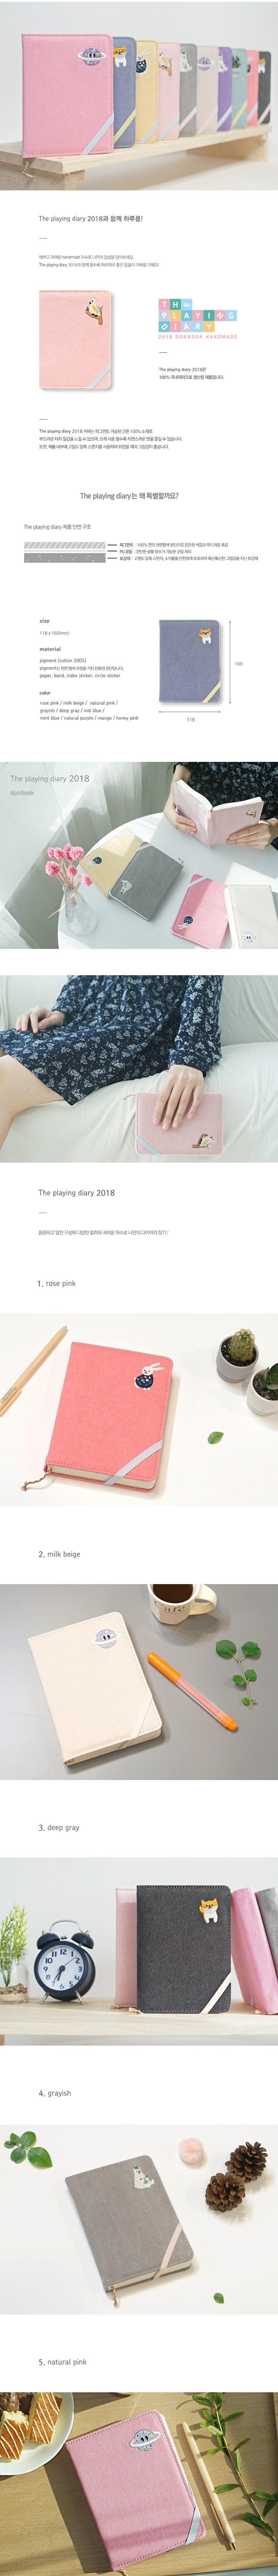 The Playing DIARY18,000원-돈북디자인문구, 다이어리/캘린더, 2018 다이어리, 일러스트바보사랑The Playing DIARY18,000원-돈북디자인문구, 다이어리/캘린더, 2018 다이어리, 일러스트바보사랑